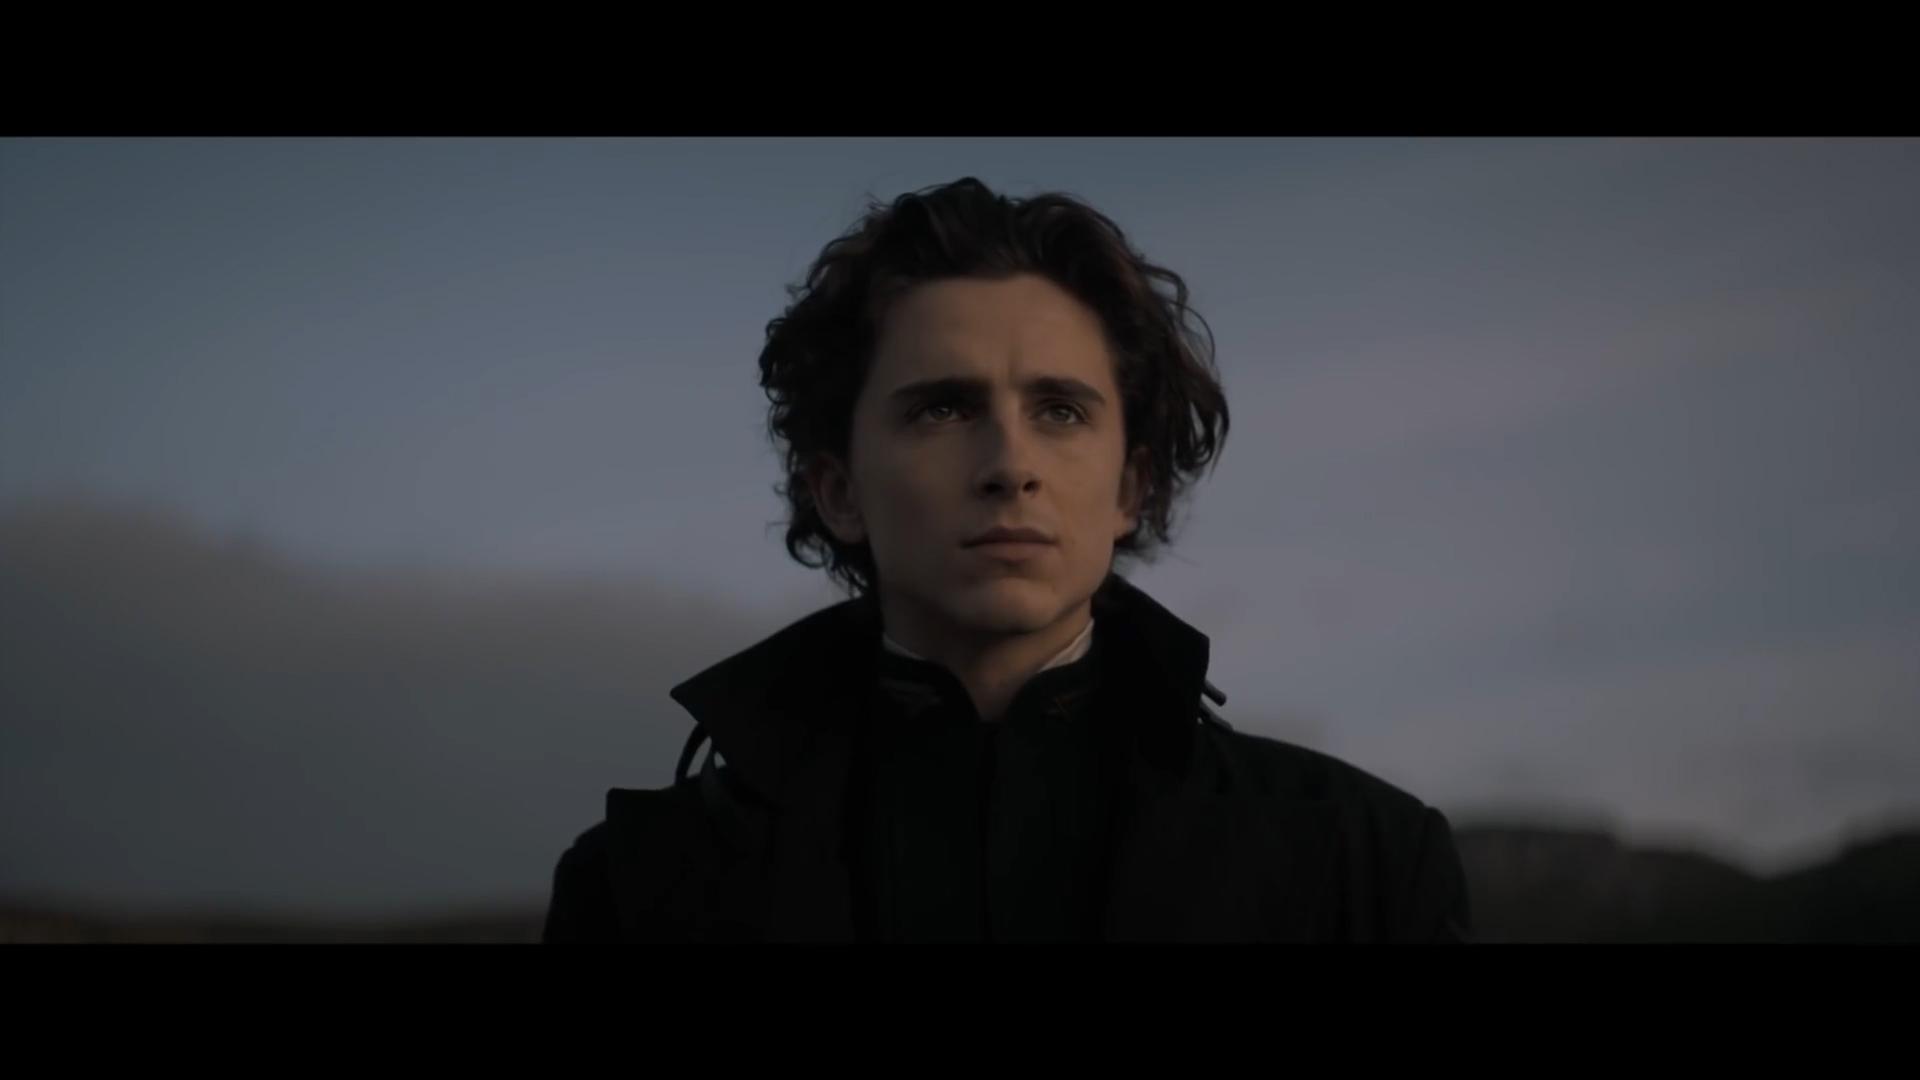 [1] Dune - Official Trailer